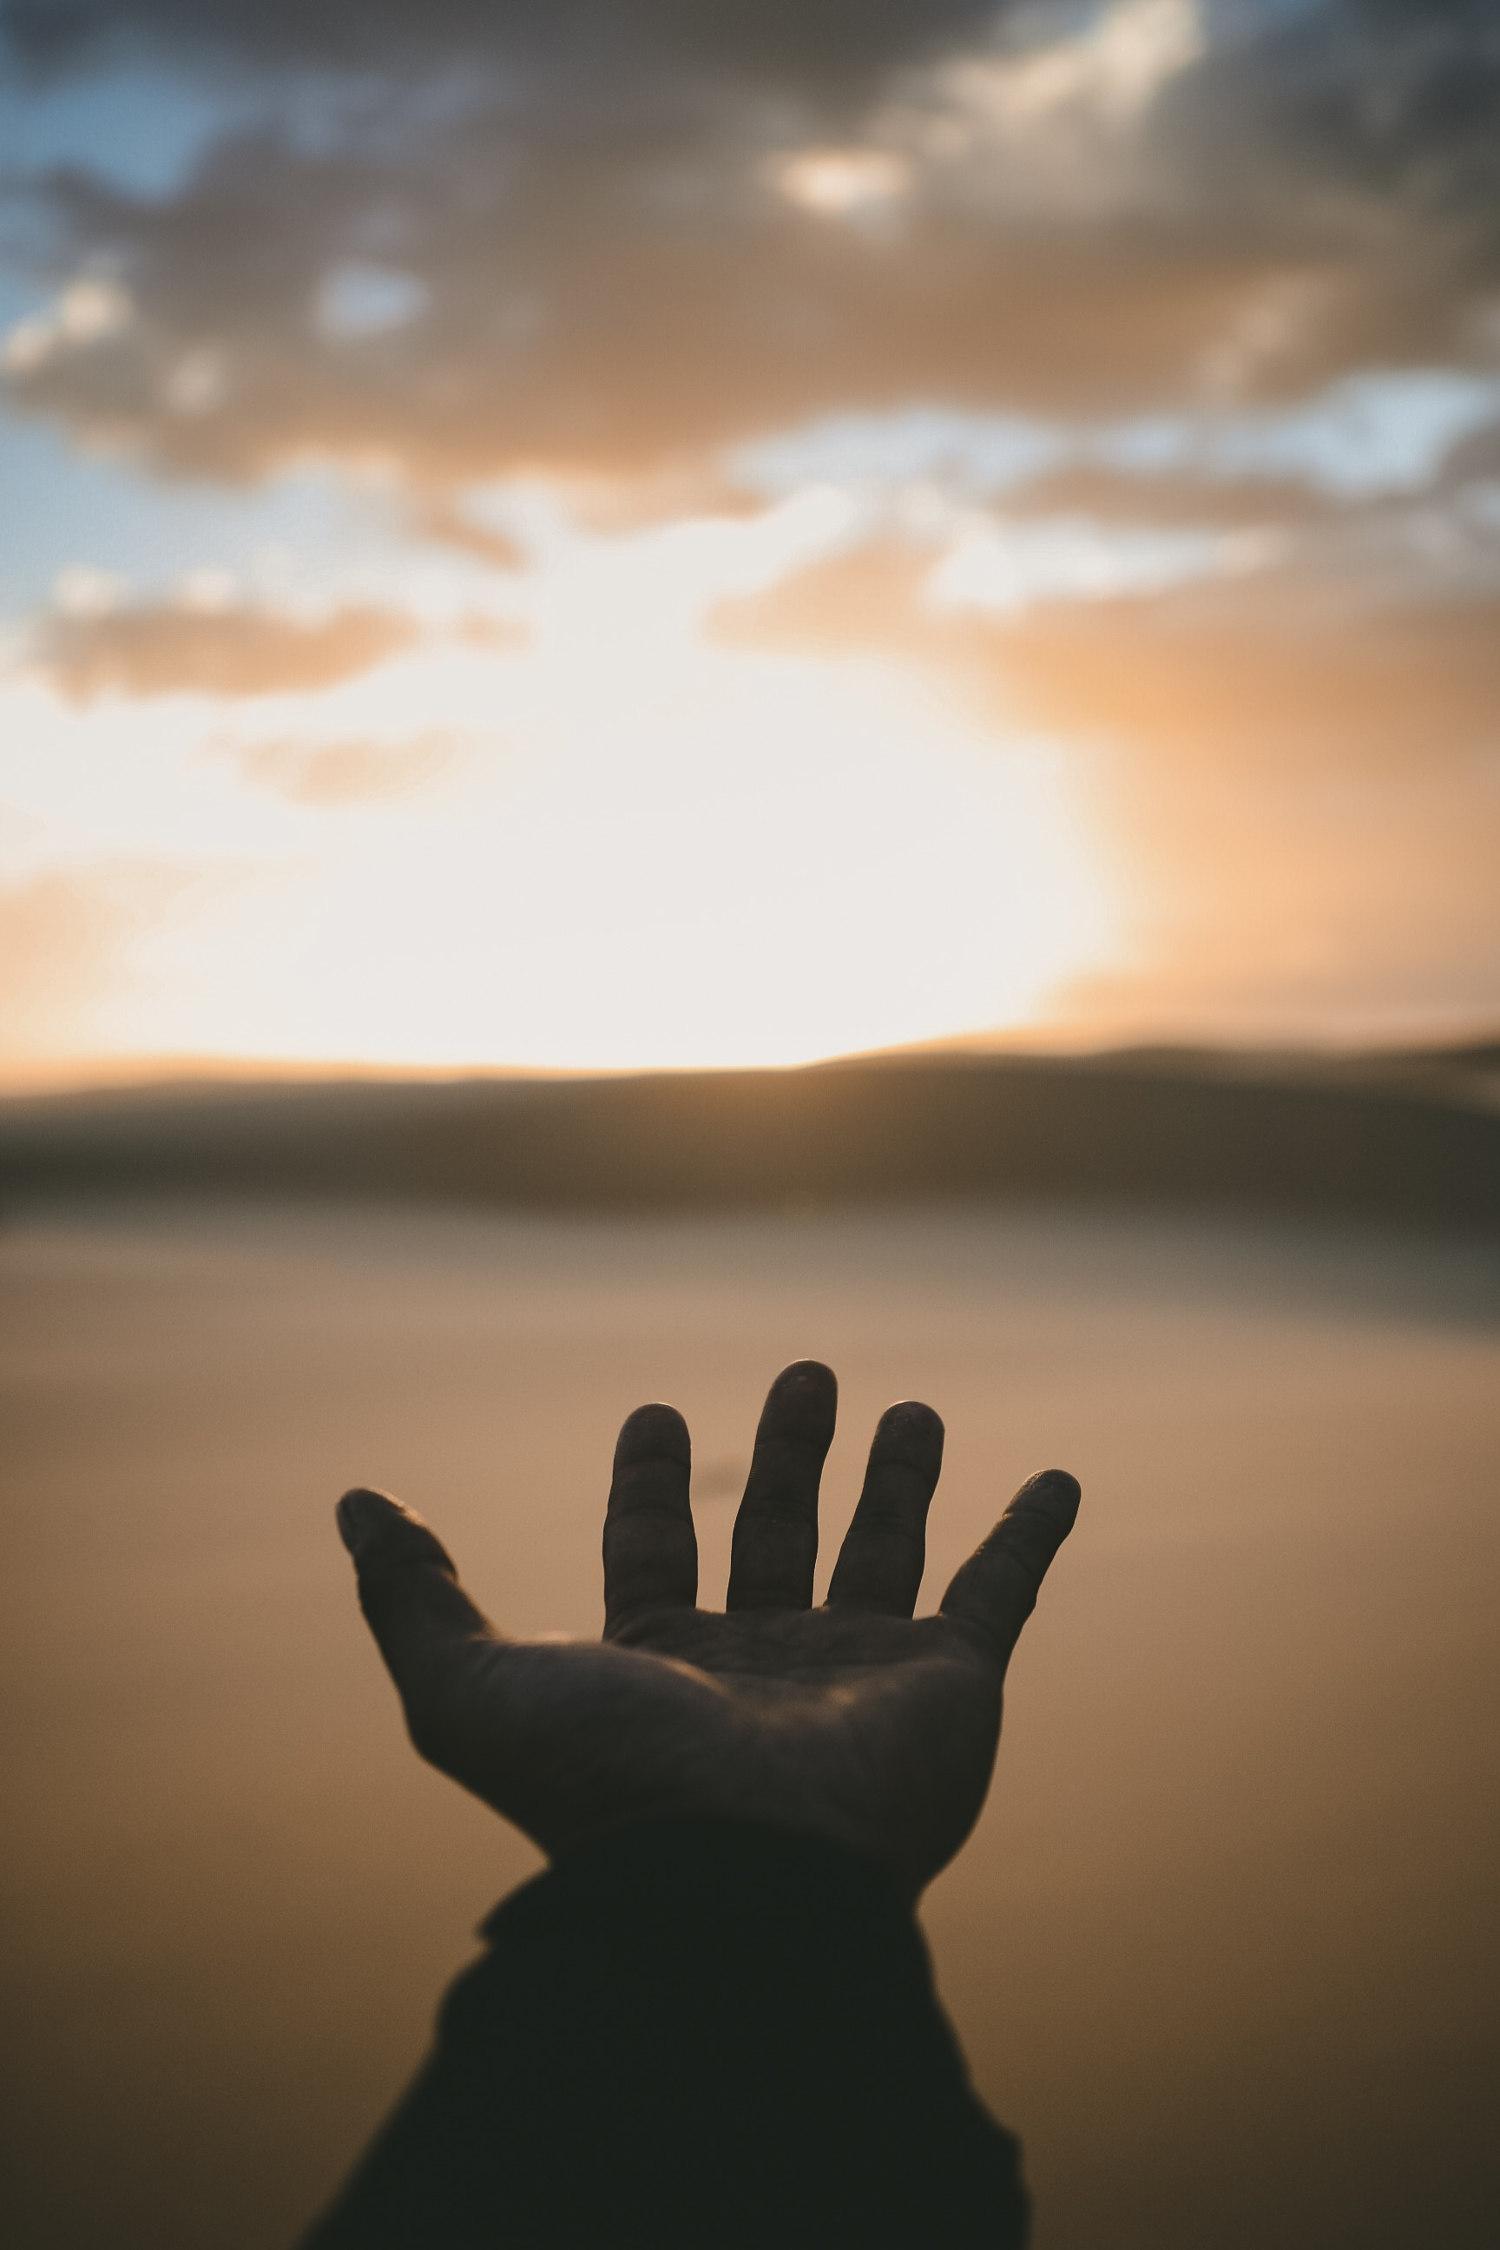 hand-reaching-out.jpg